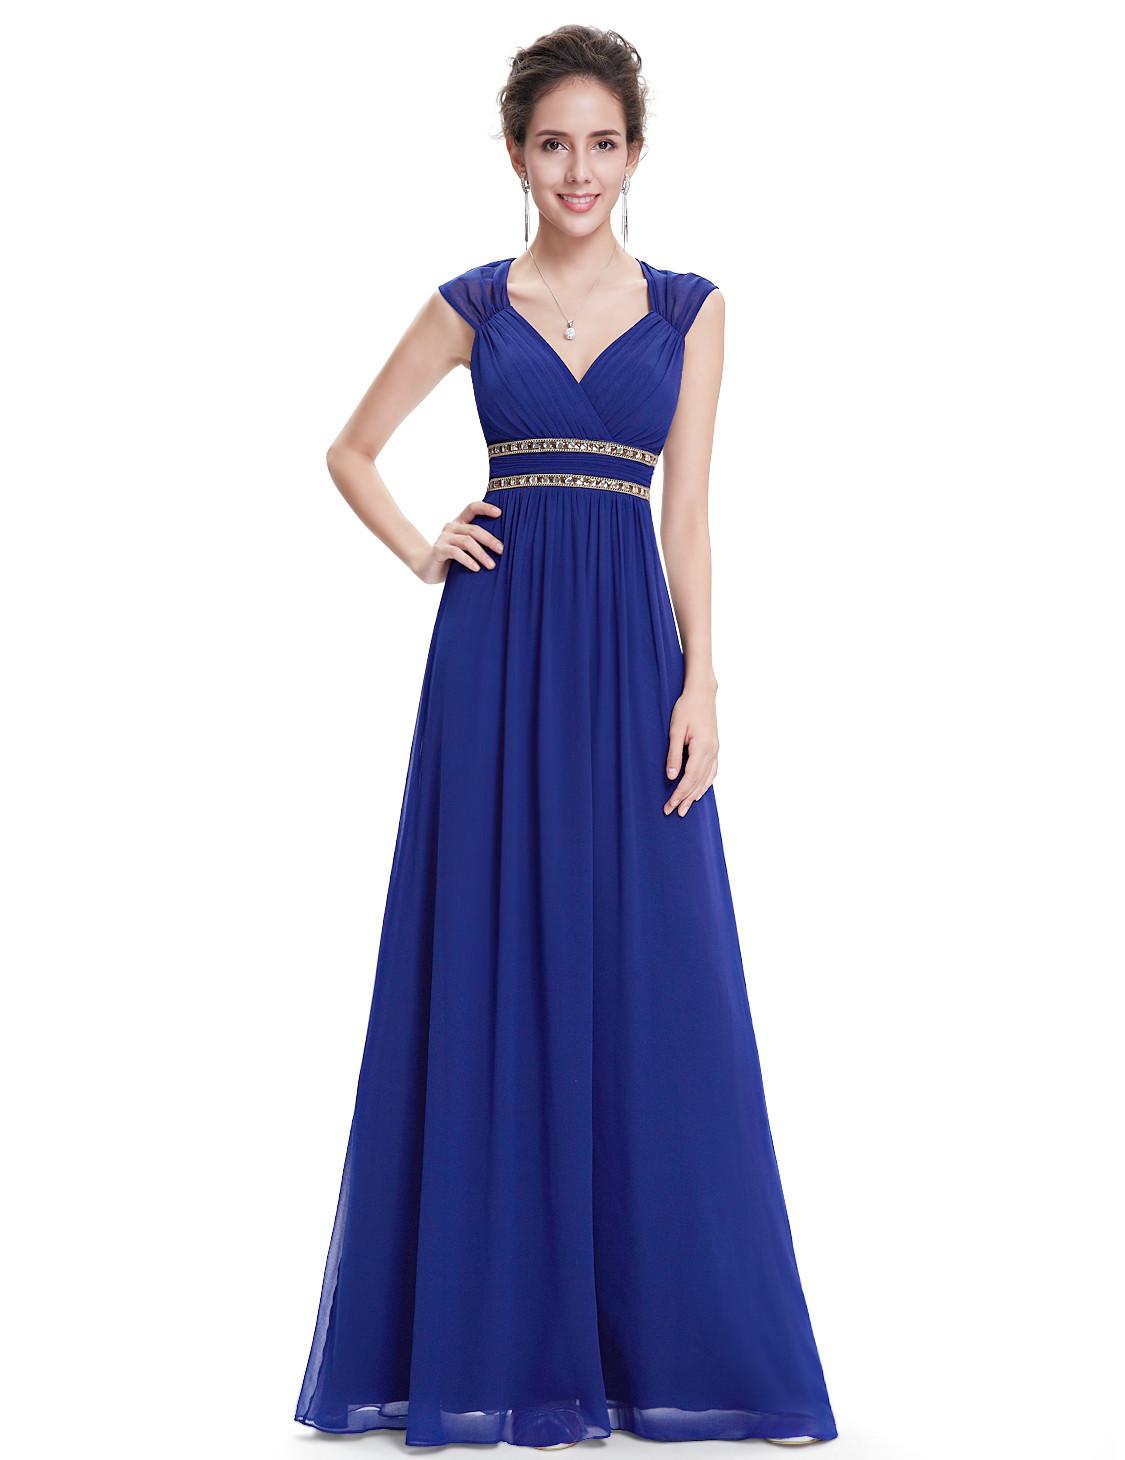 2017 Elegant V-neck Bridesmaid Dress Royal Blue